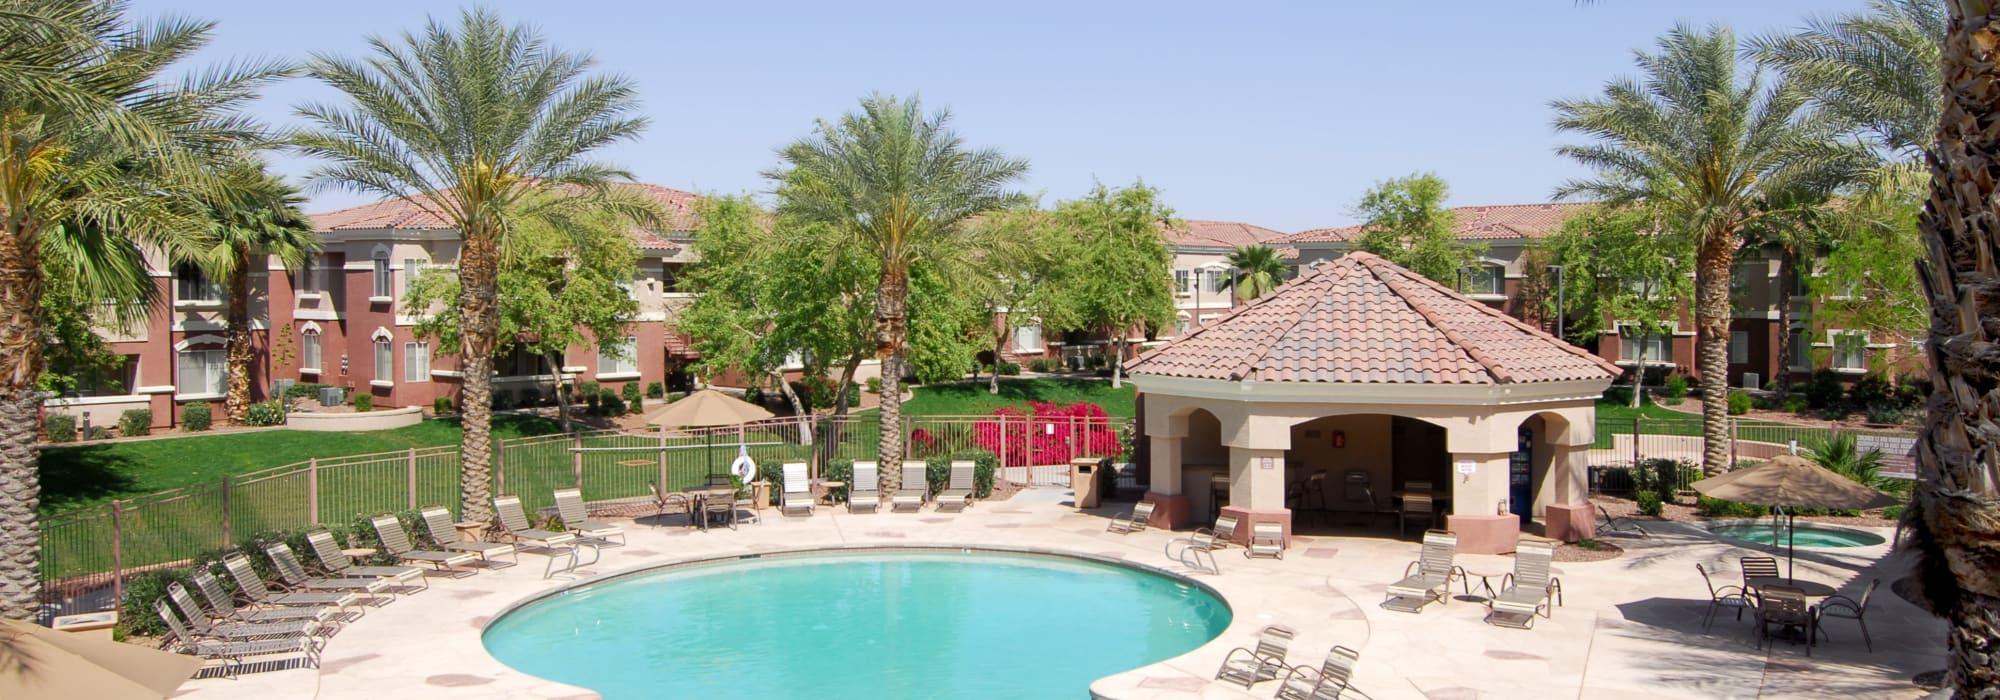 Swimming pool area at Remington Ranch in Litchfield Park, Arizona